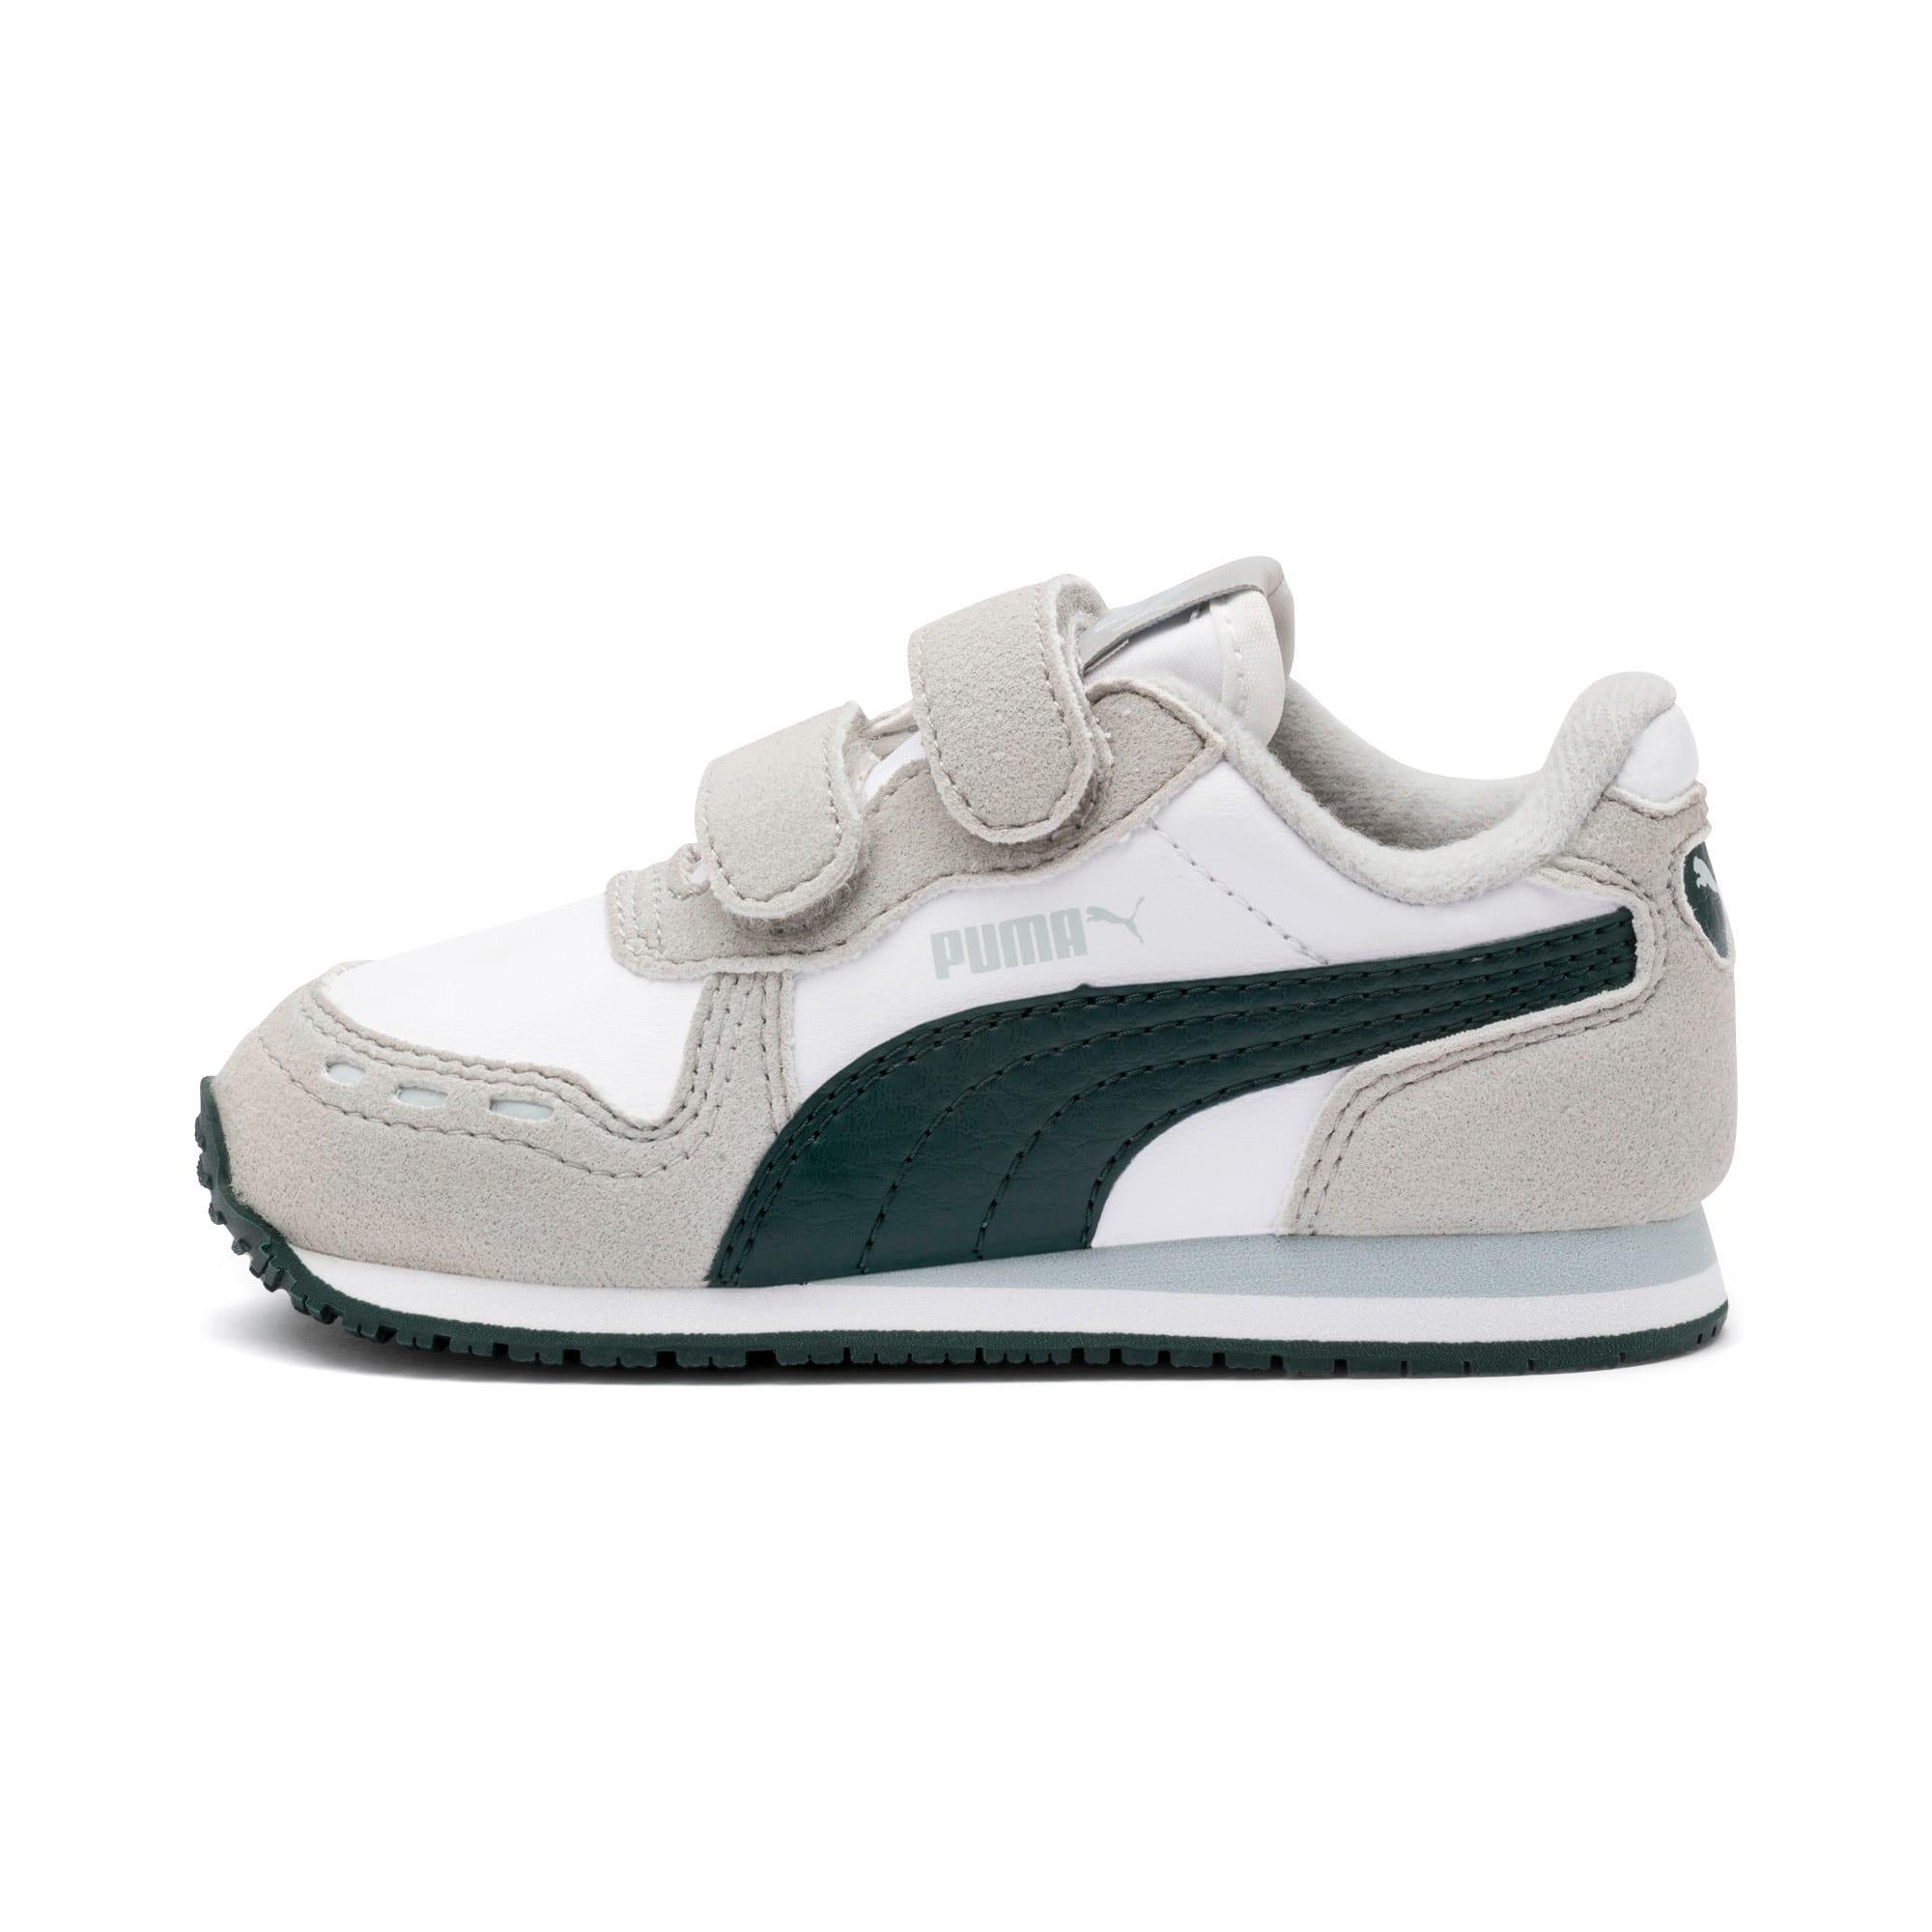 Thumbnail 1 of Cabana Racer SL AC Little Kids' Shoes, P.Wht-Gr.Violet-Ponder. Pine, medium